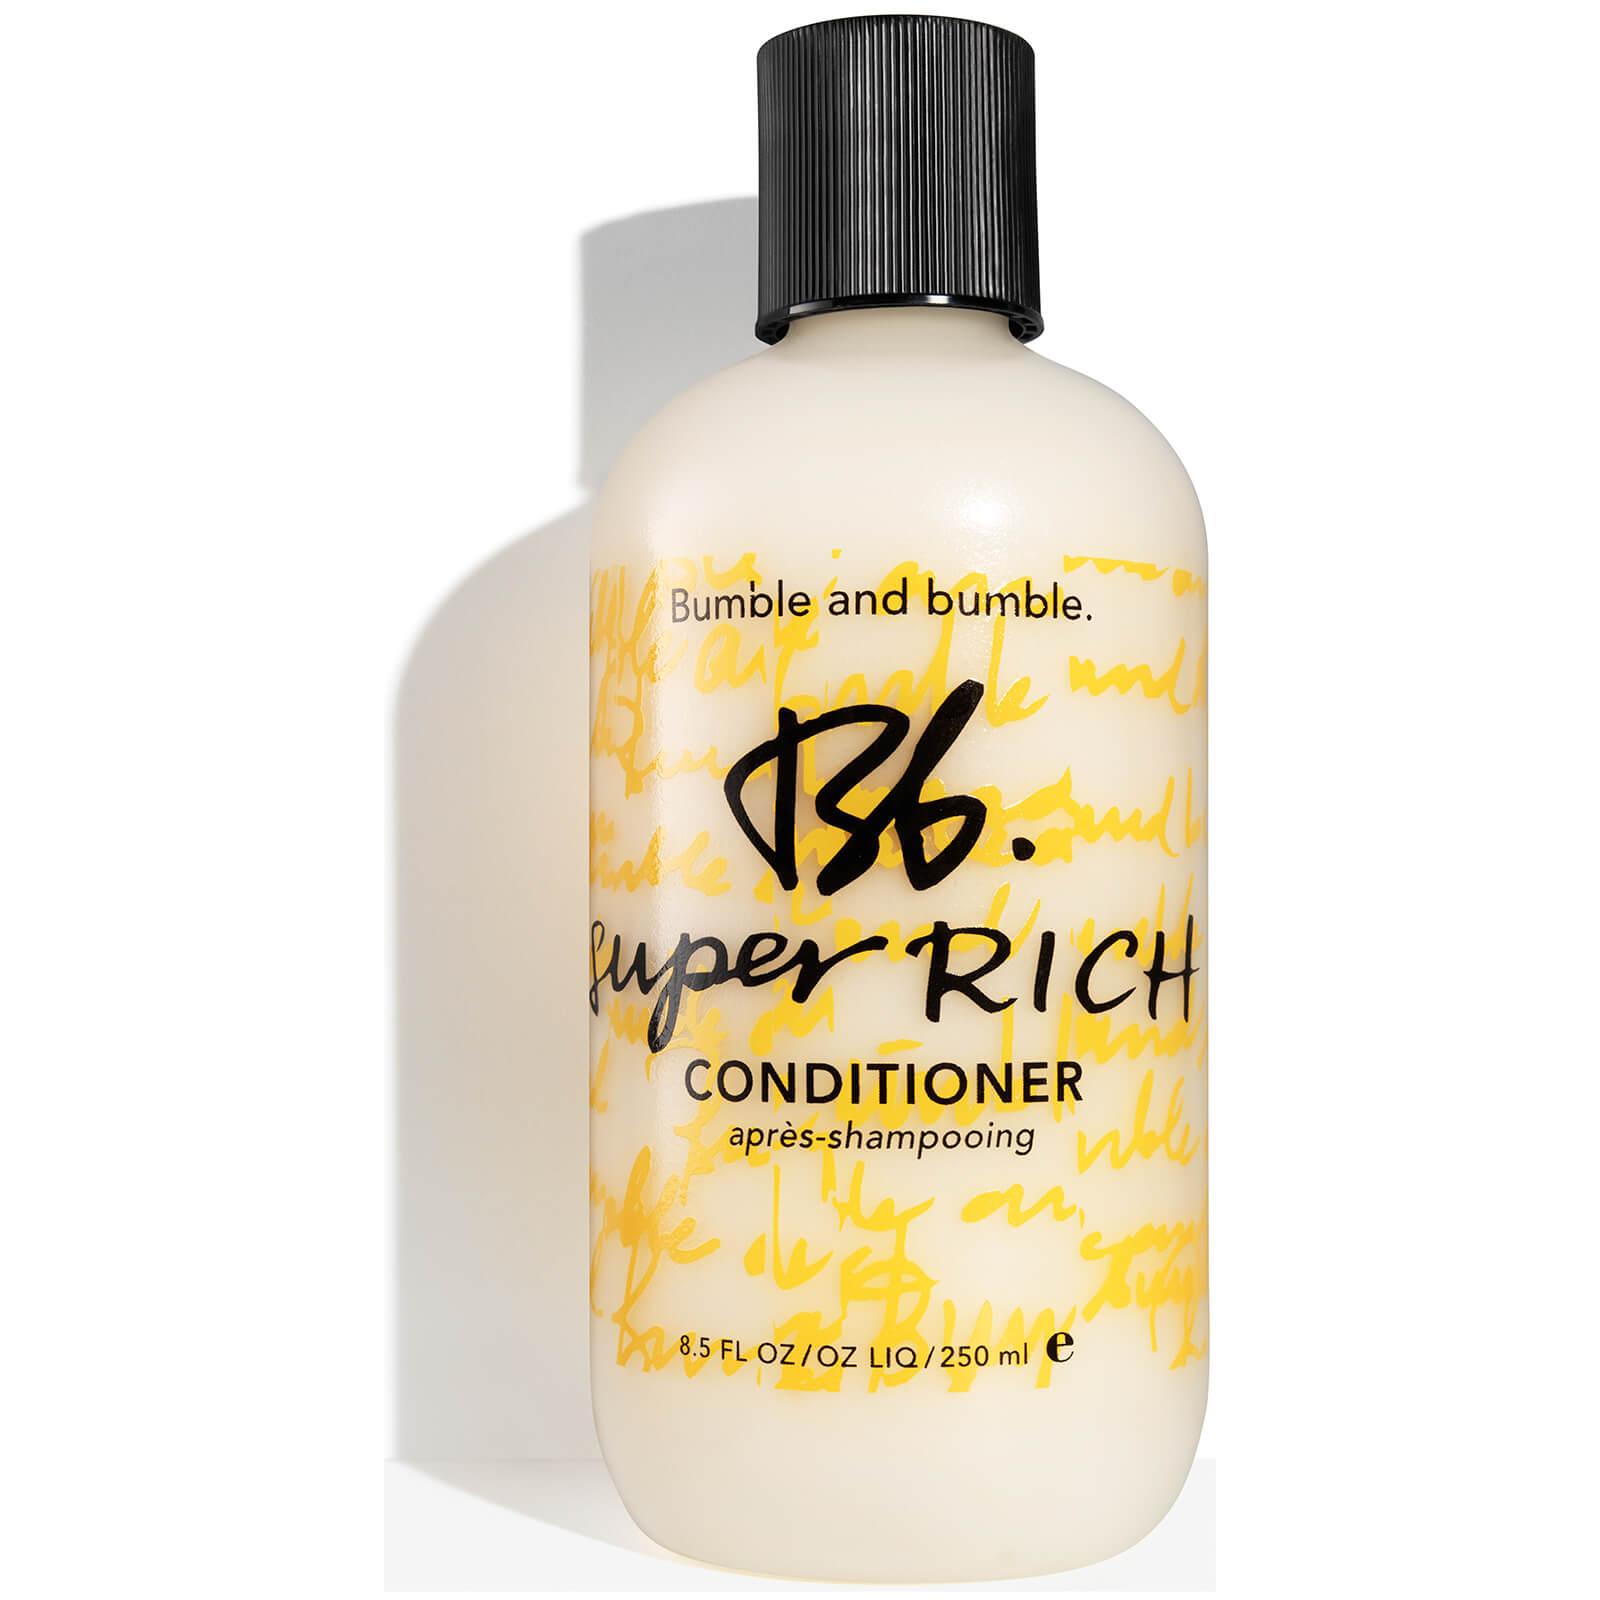 Bumble and bumble Après-shampoing super riche de Bumble and bumble 250ml